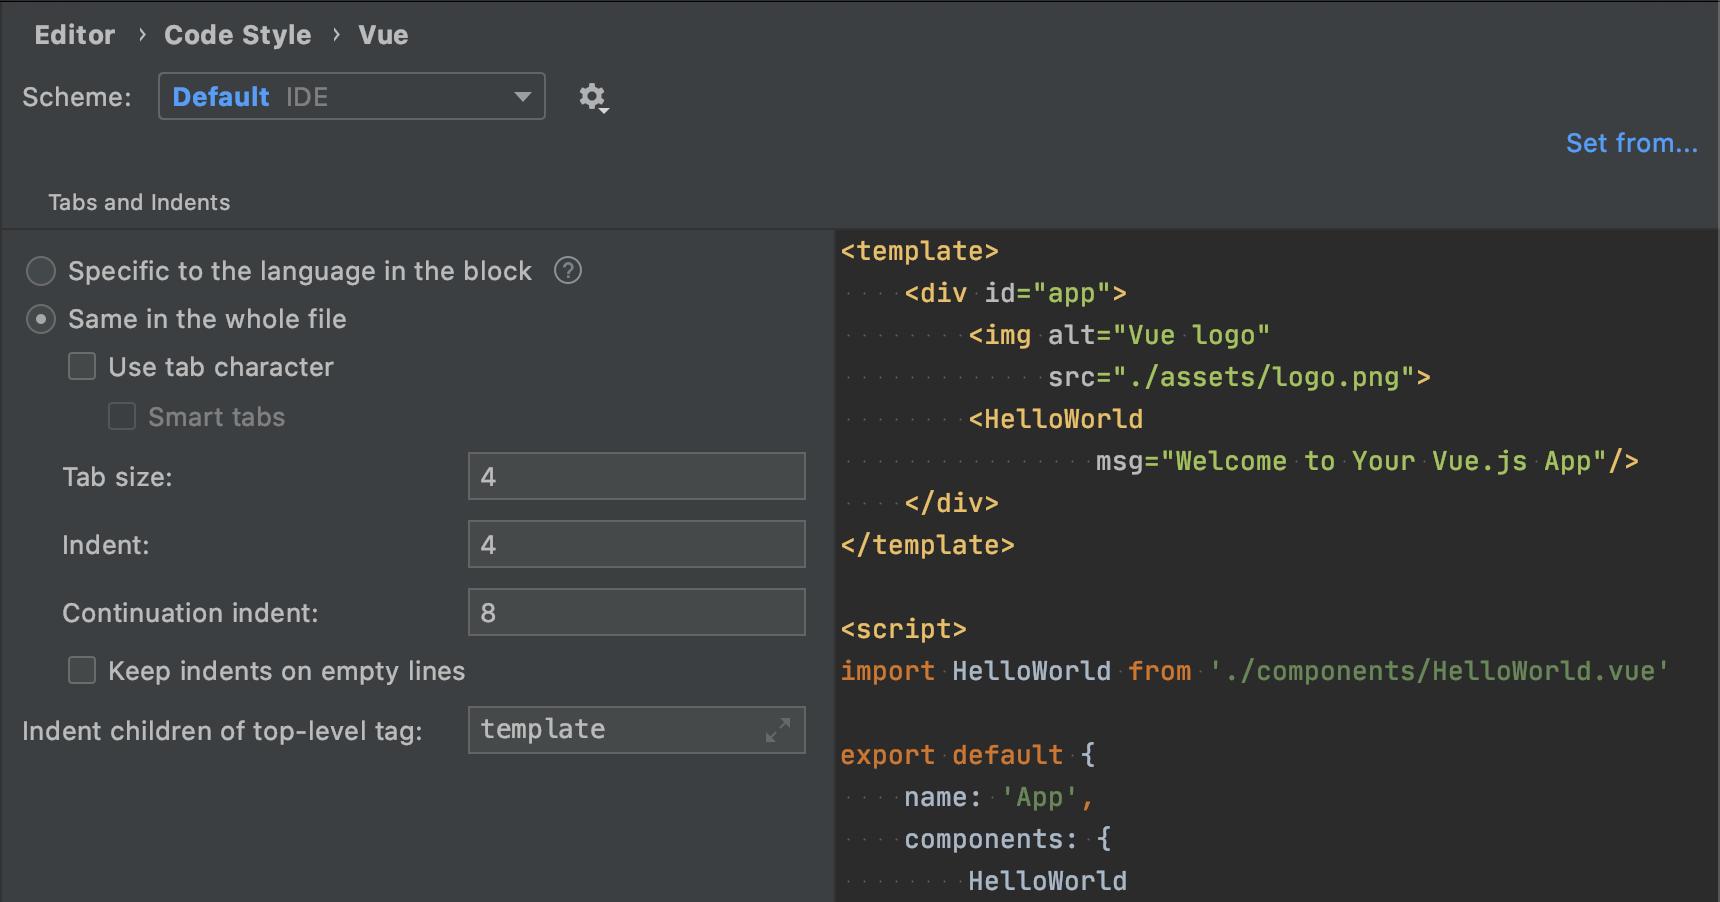 vue-code-style-settings